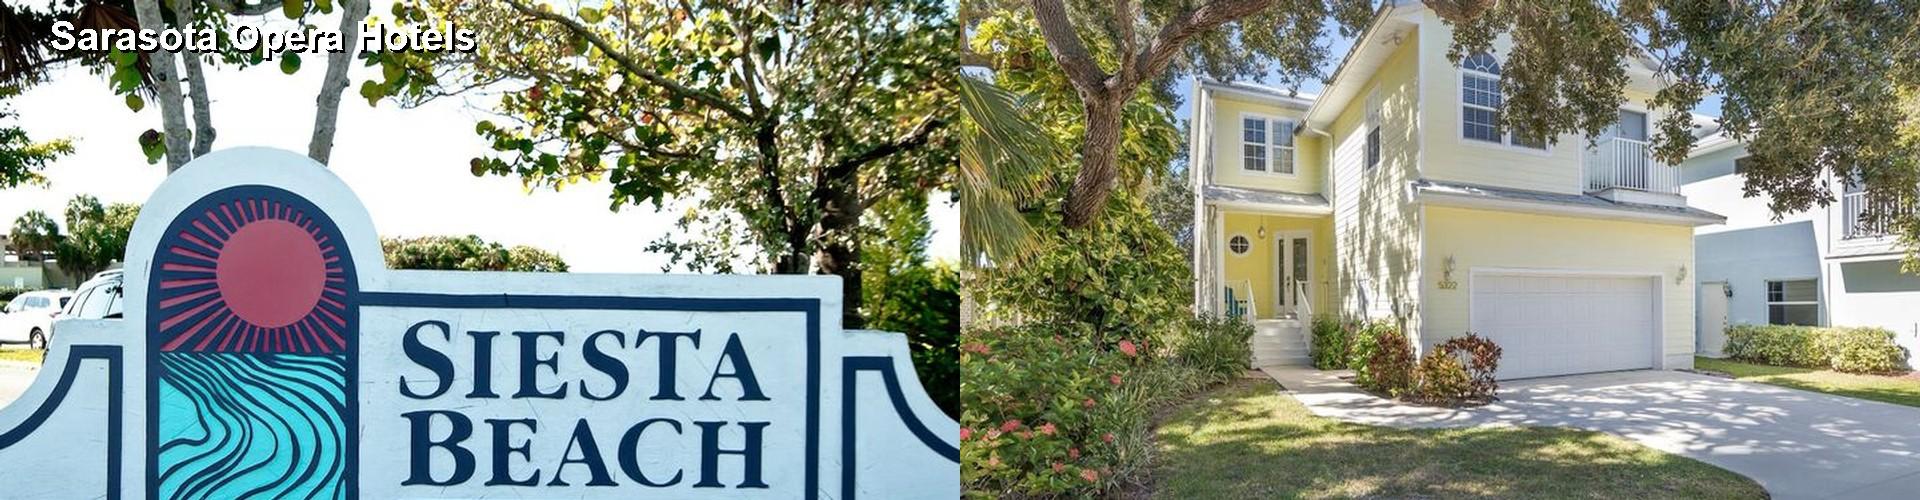 Sarasota Hotels Near Airport Rouydadnews Info